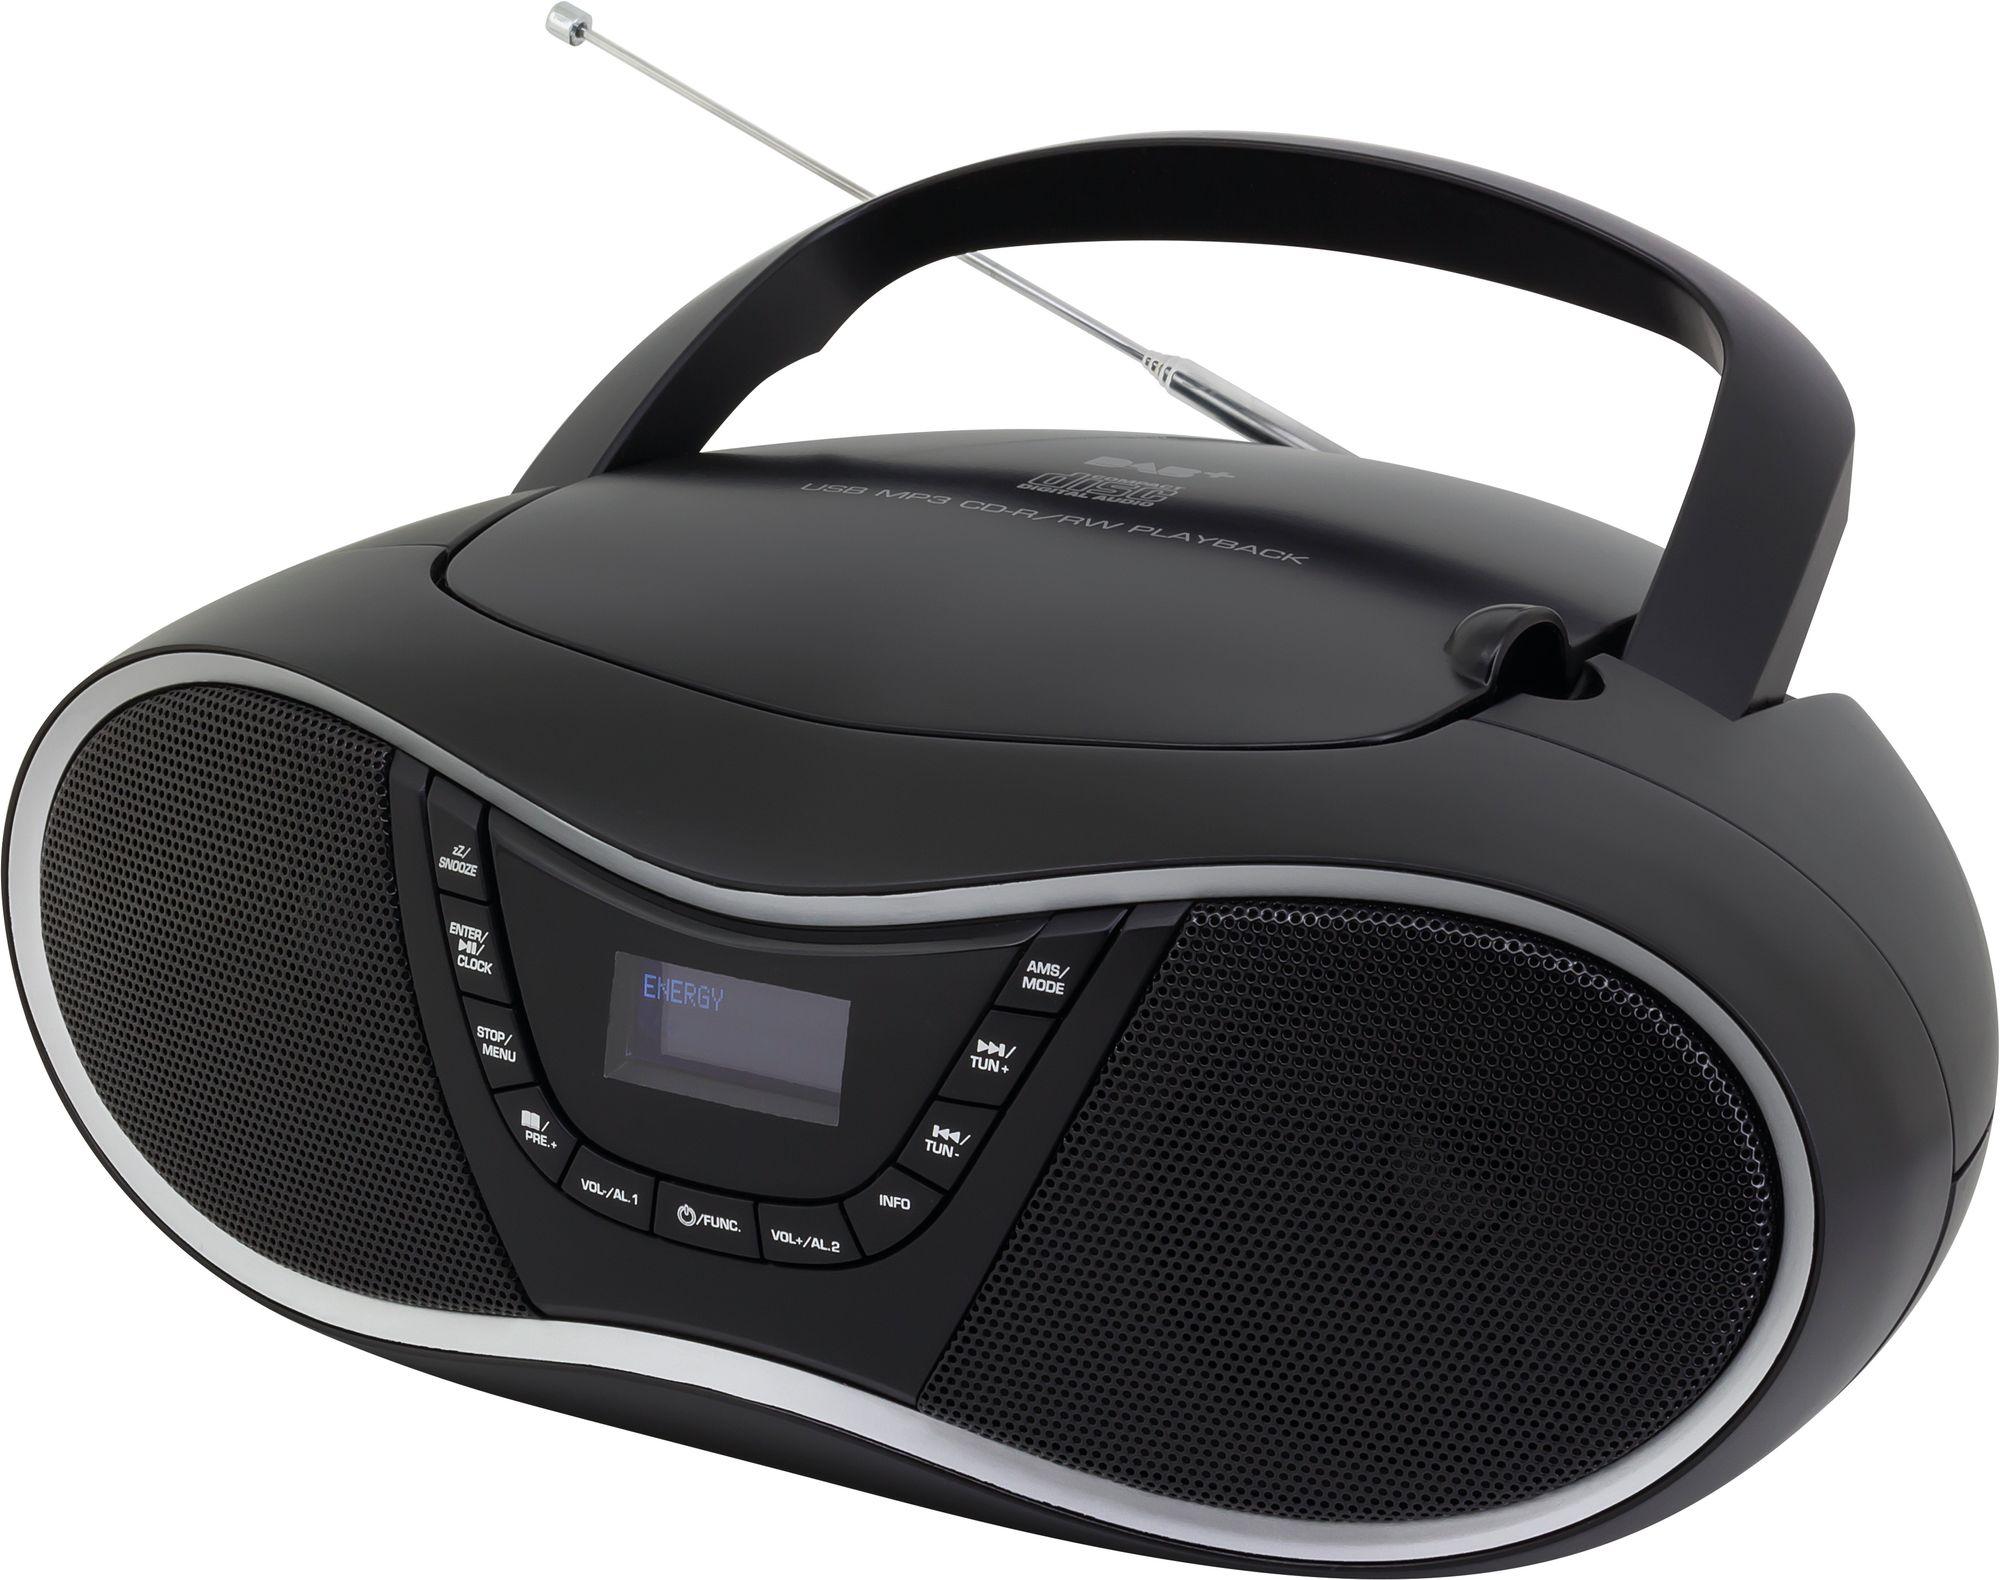 scd1990sw radiorekorder radio mit cd. Black Bedroom Furniture Sets. Home Design Ideas